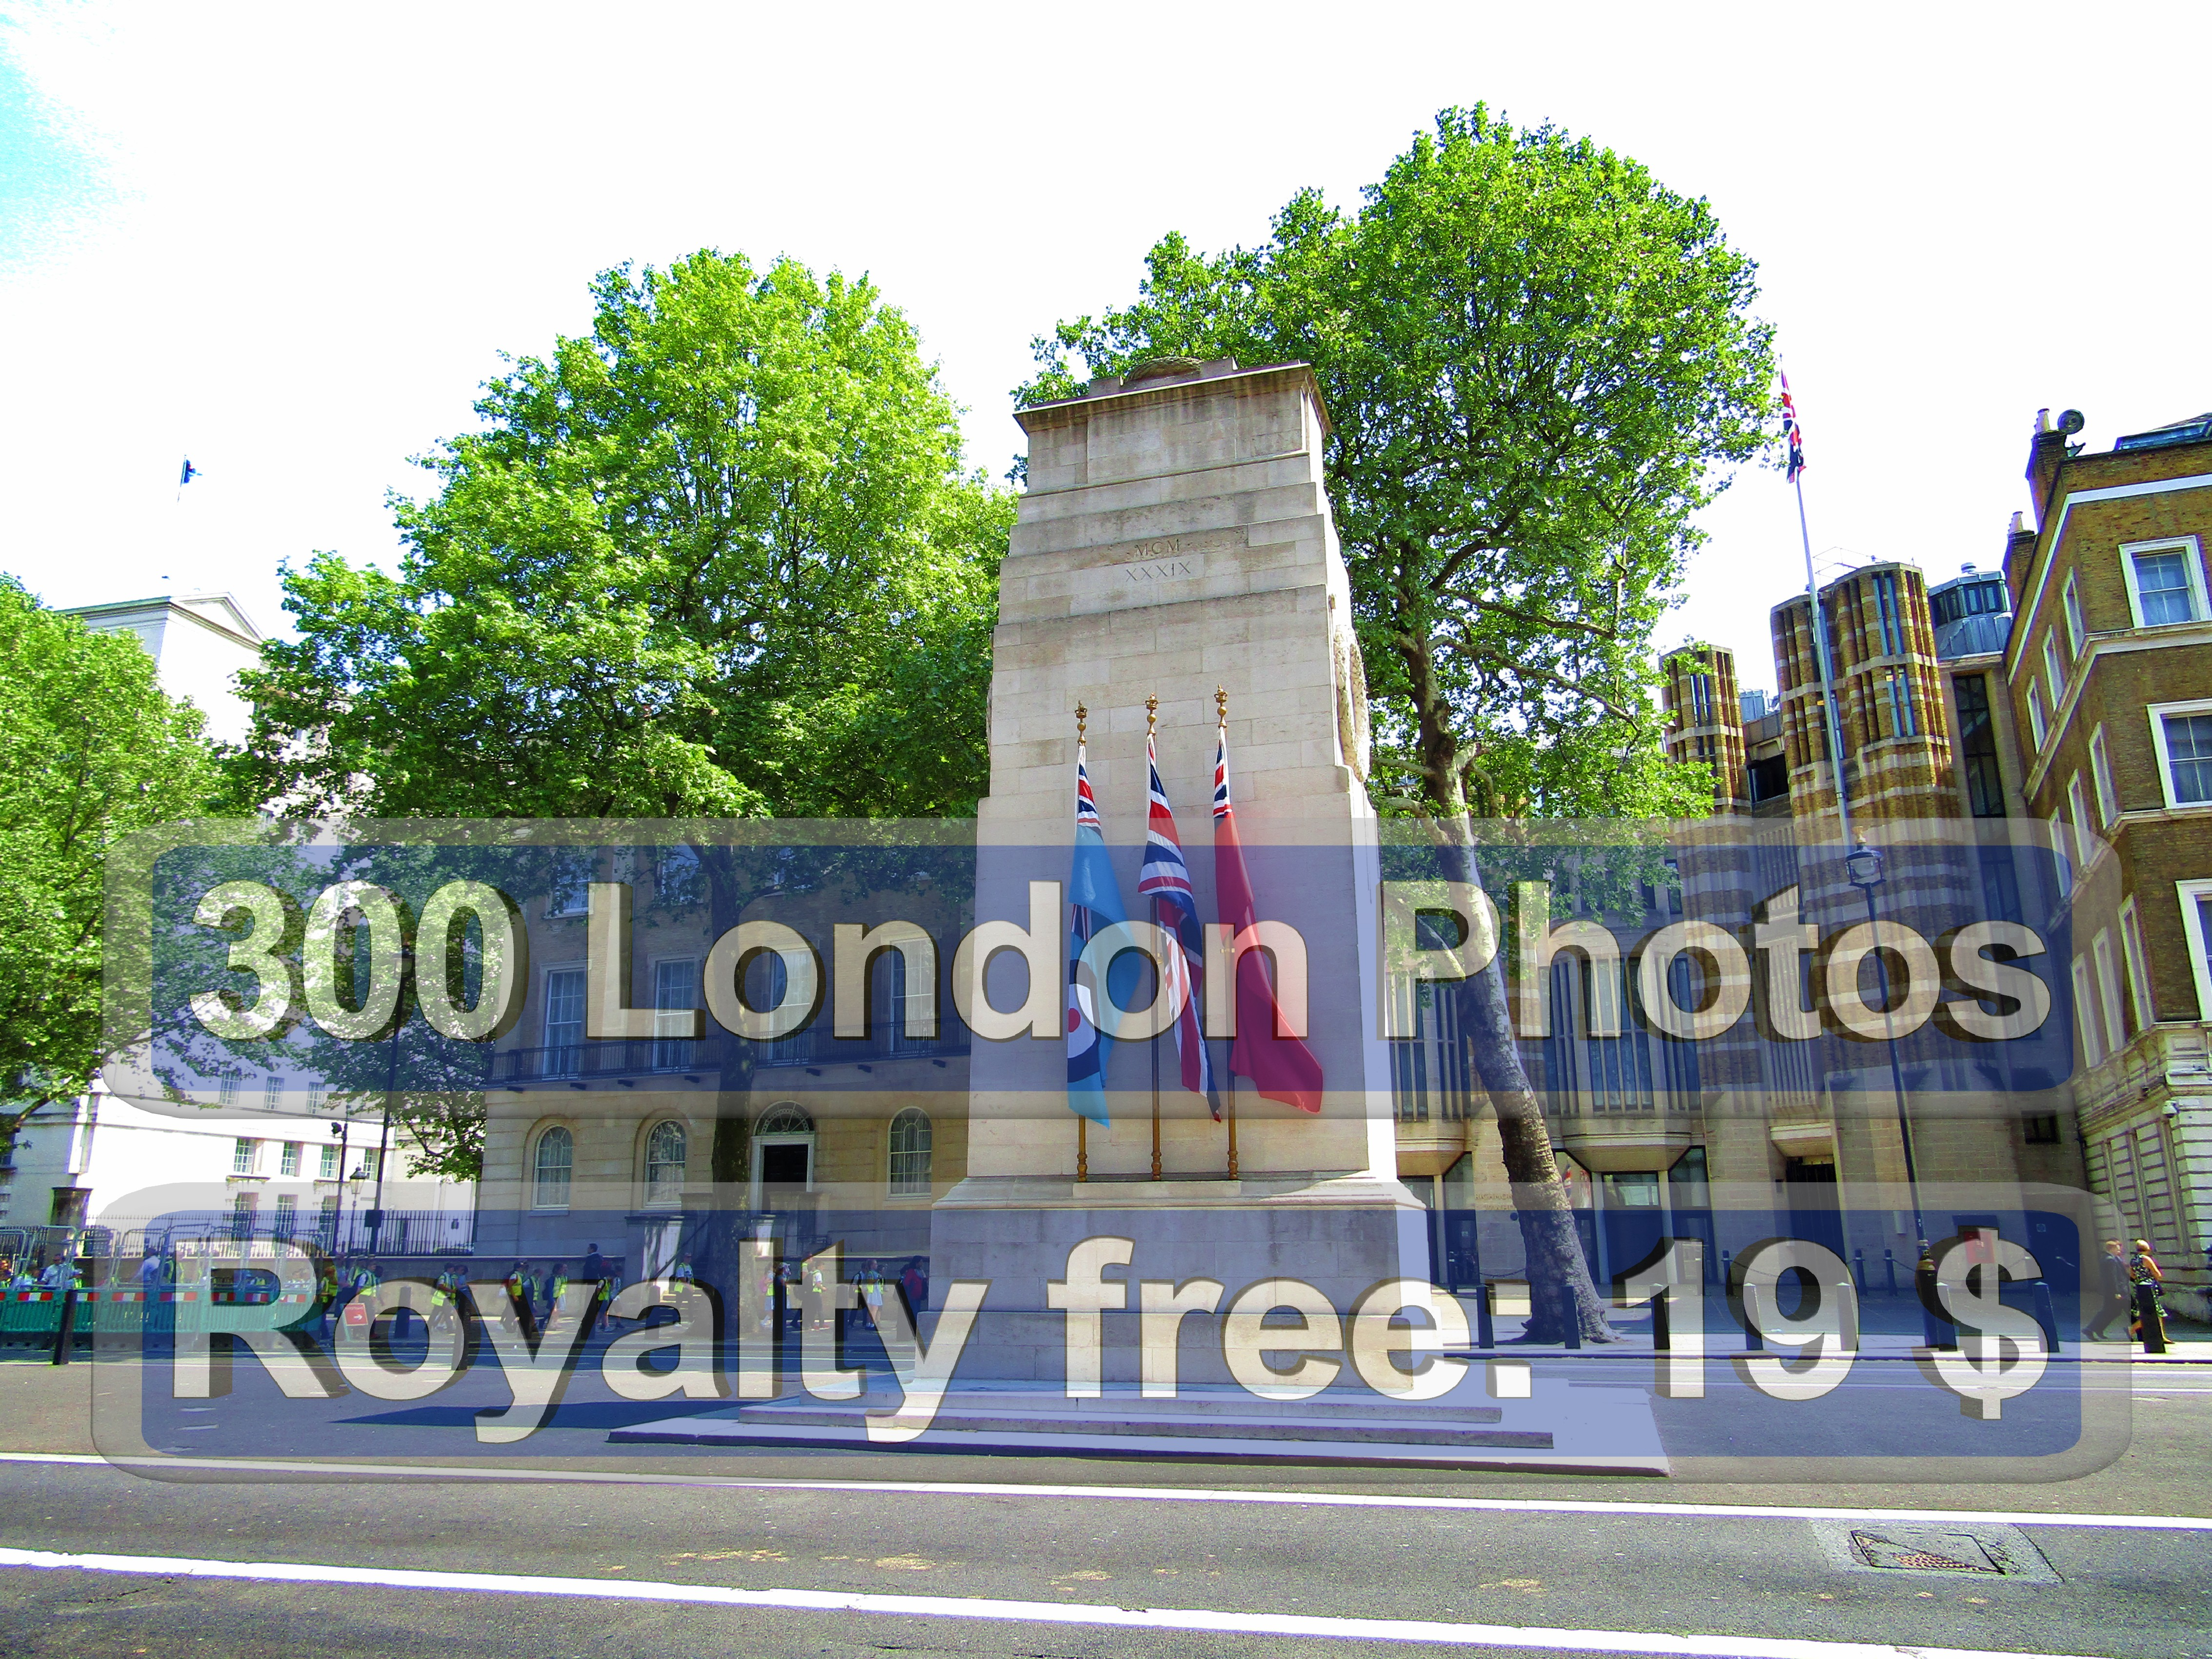 London On Photographers